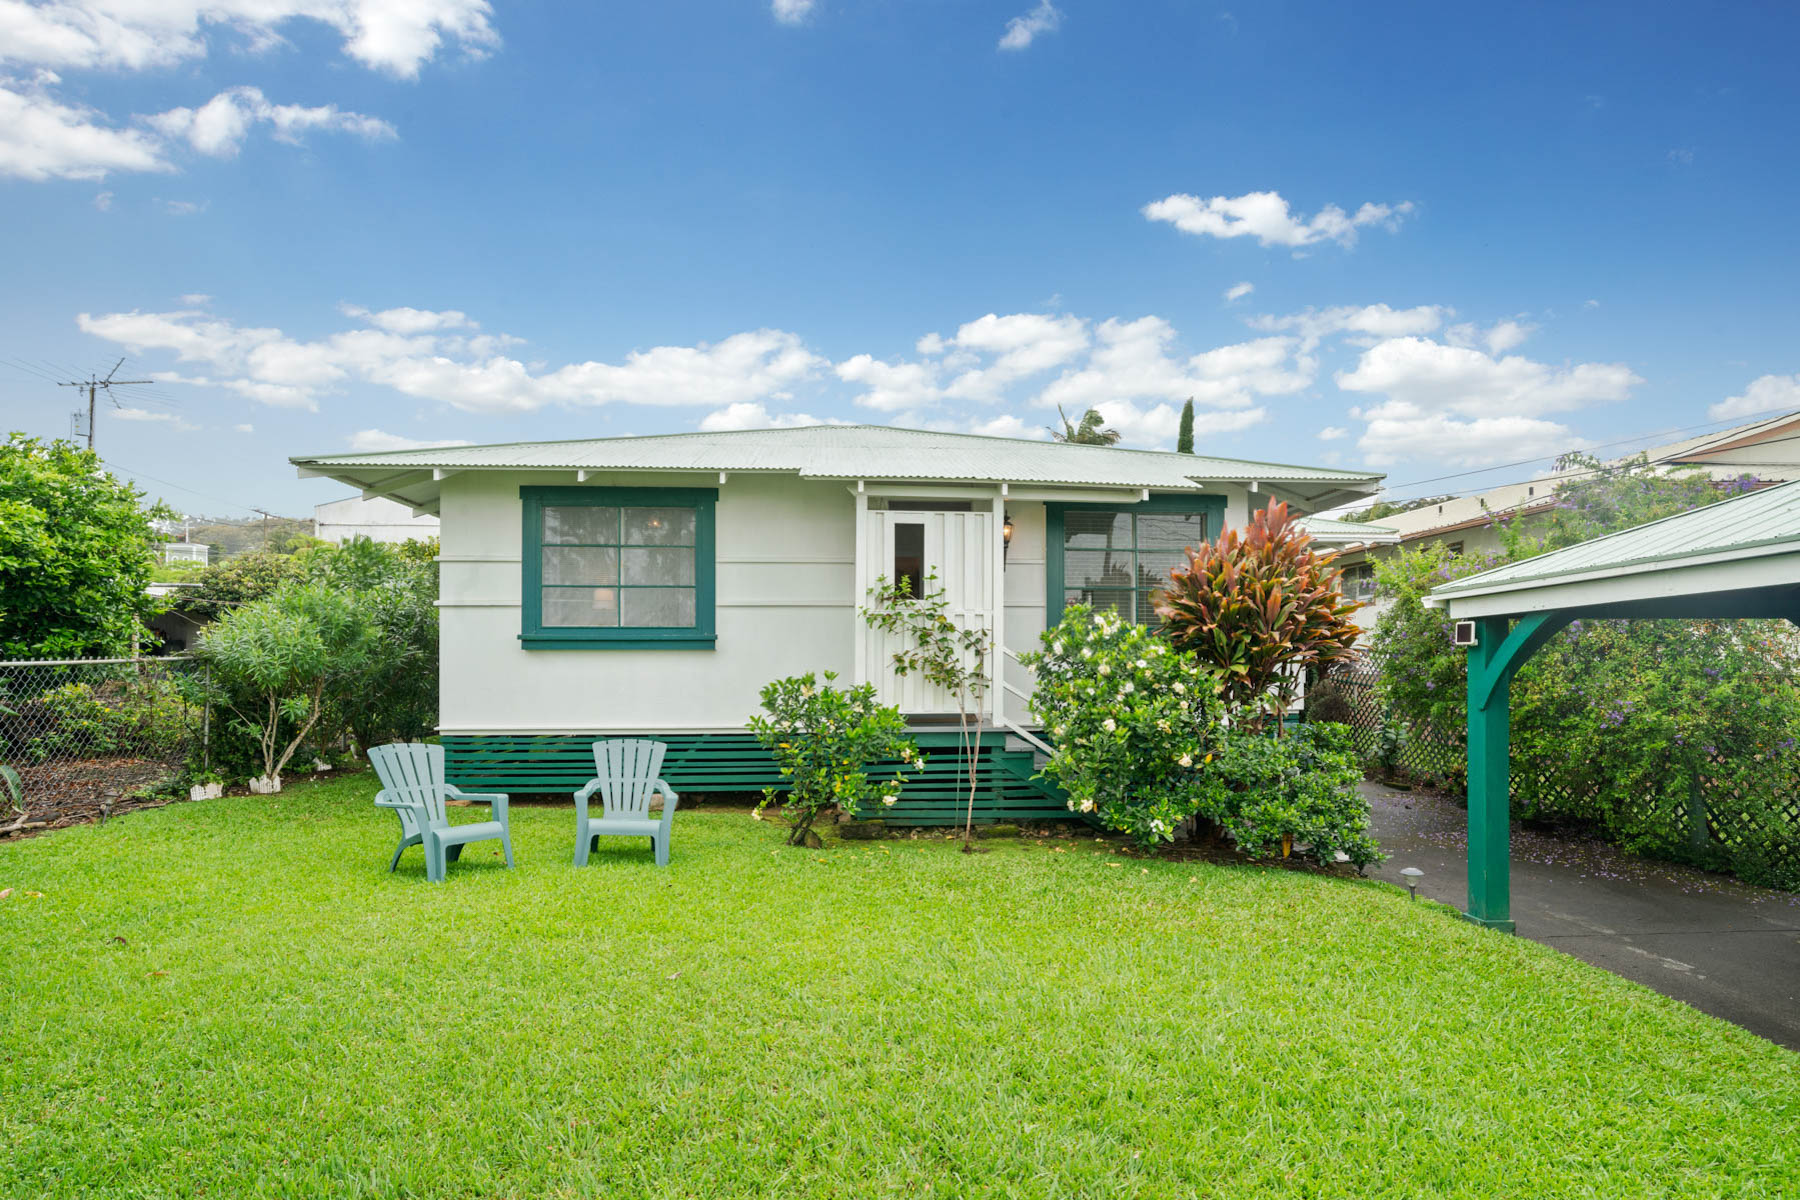 Single Family Homes for Active at Charming Home 45-3483 Koa St. Honokaa, Hawaii 96727 United States